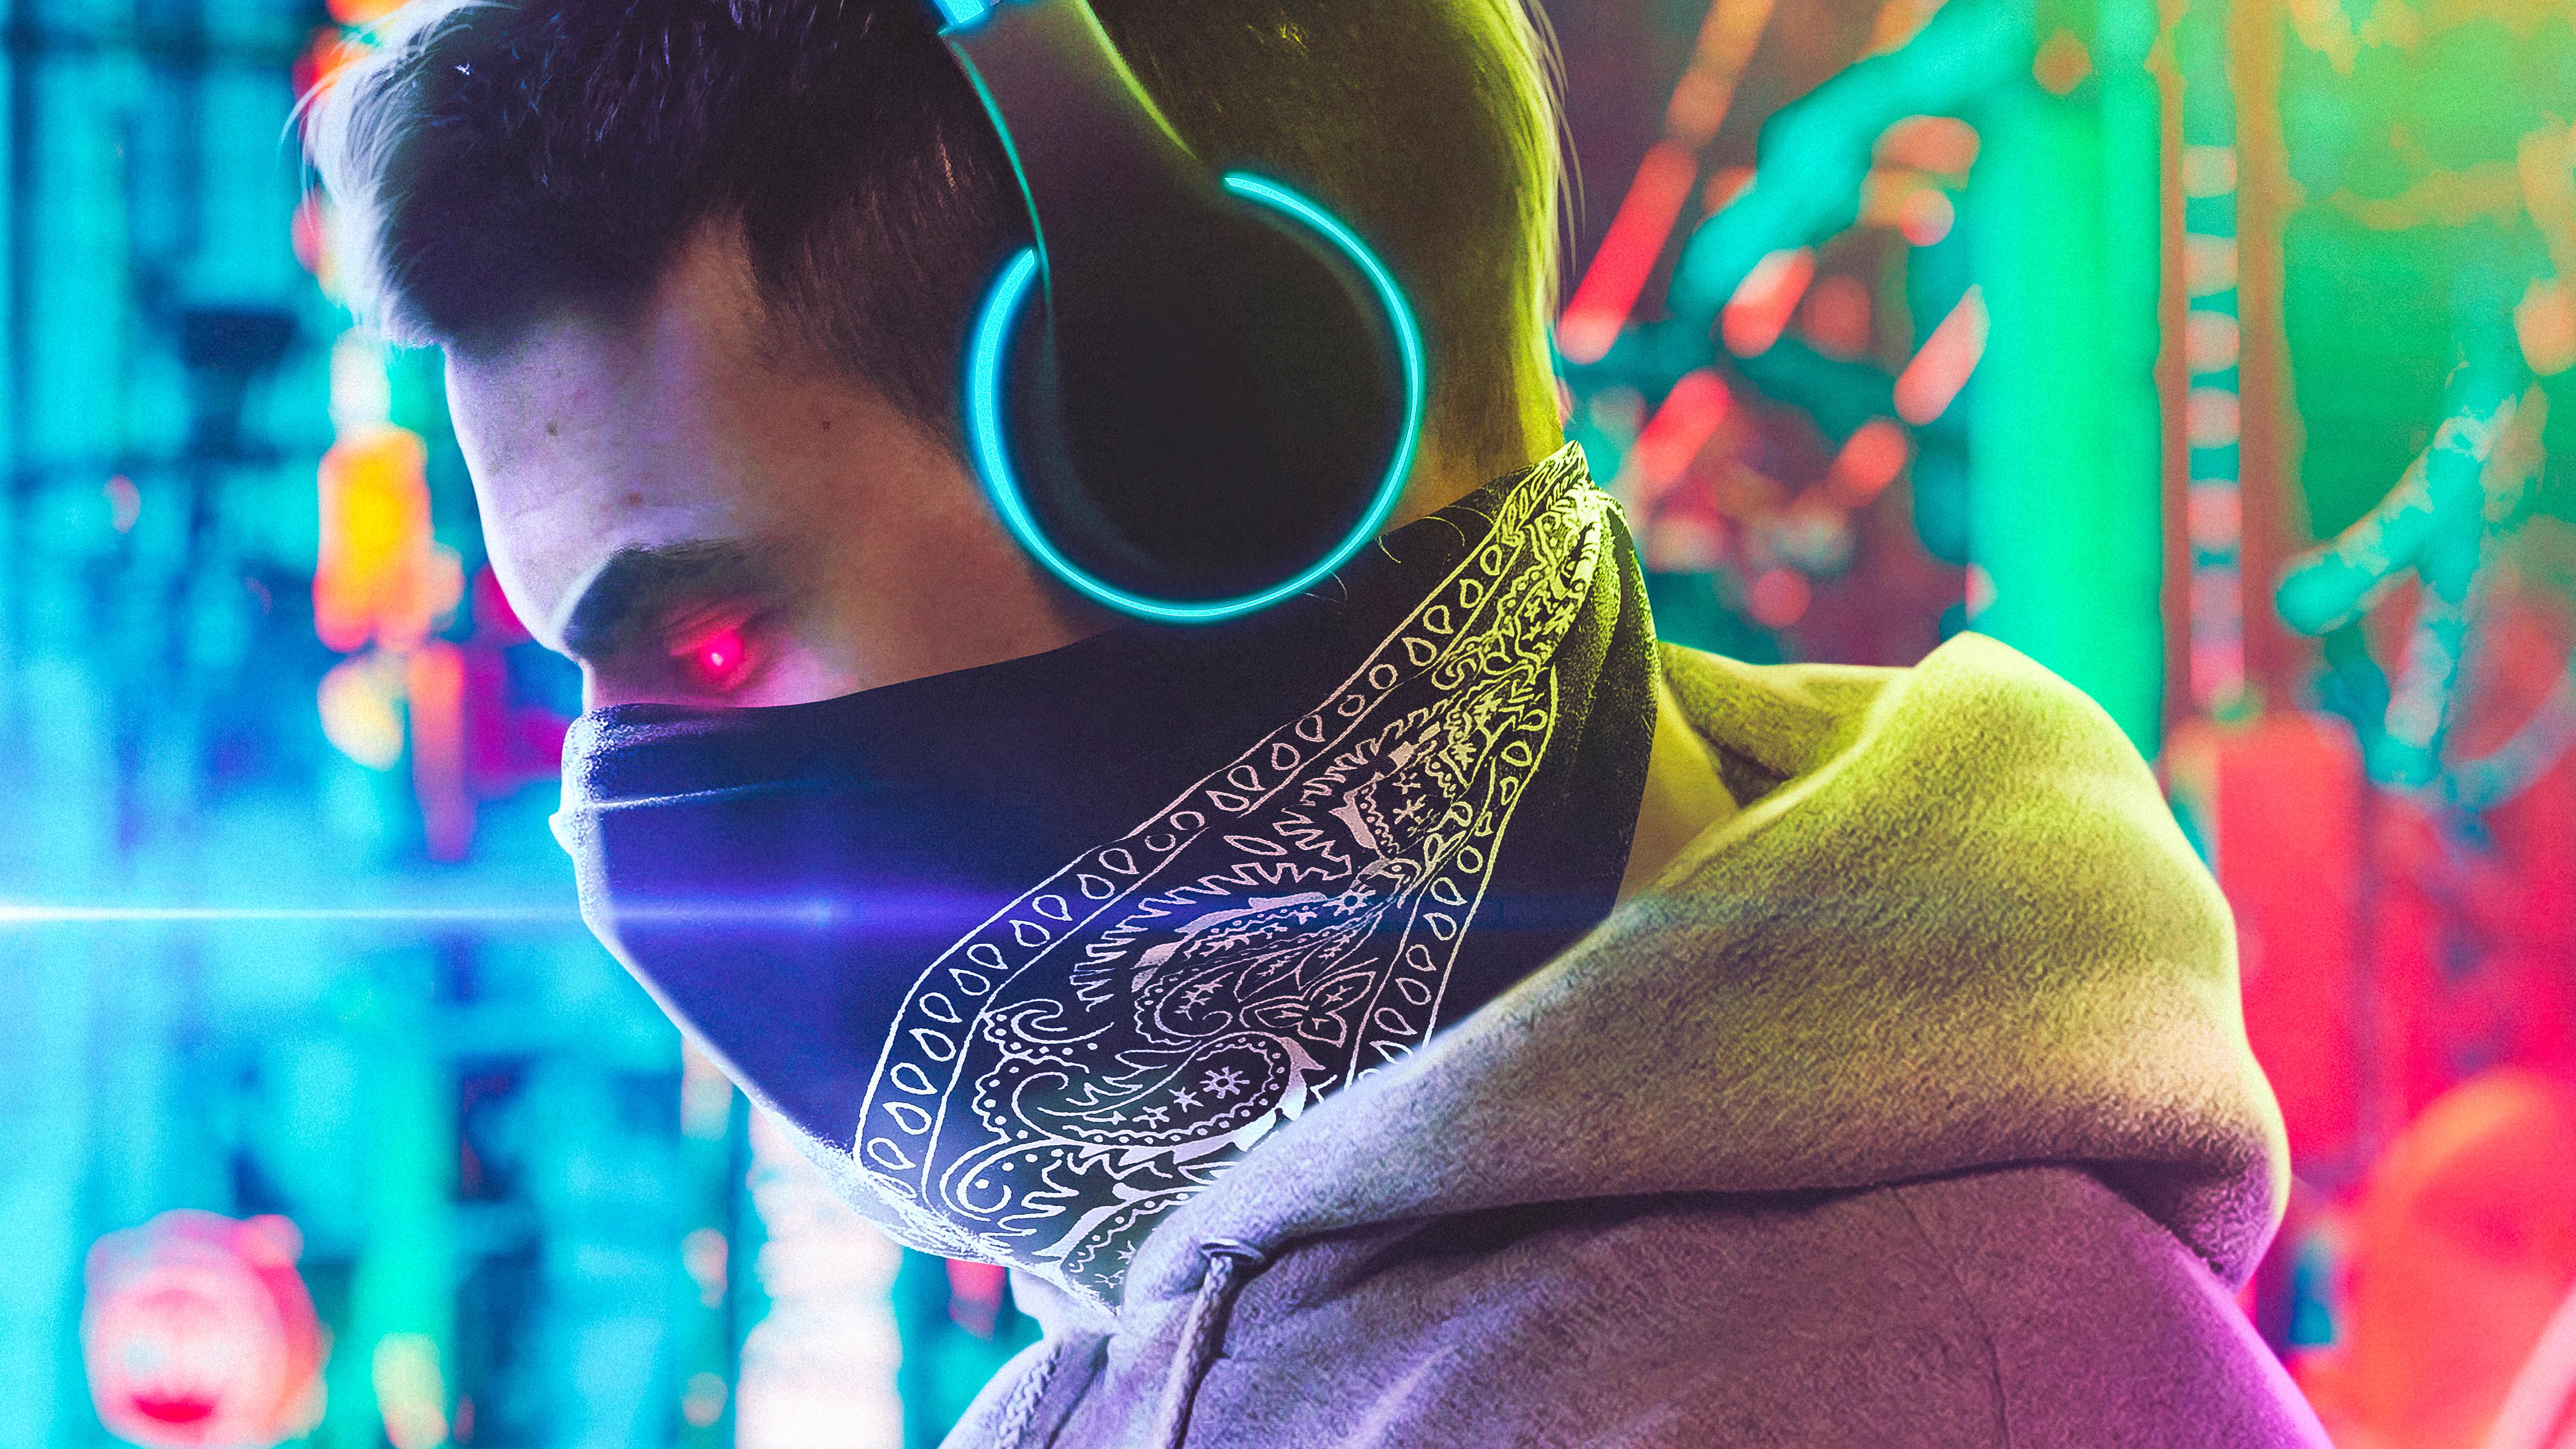 cool boy headphones 4k 1618131614 - Cool Boy Headphones 4k - Cool Boy Headphones 4k wallpapers